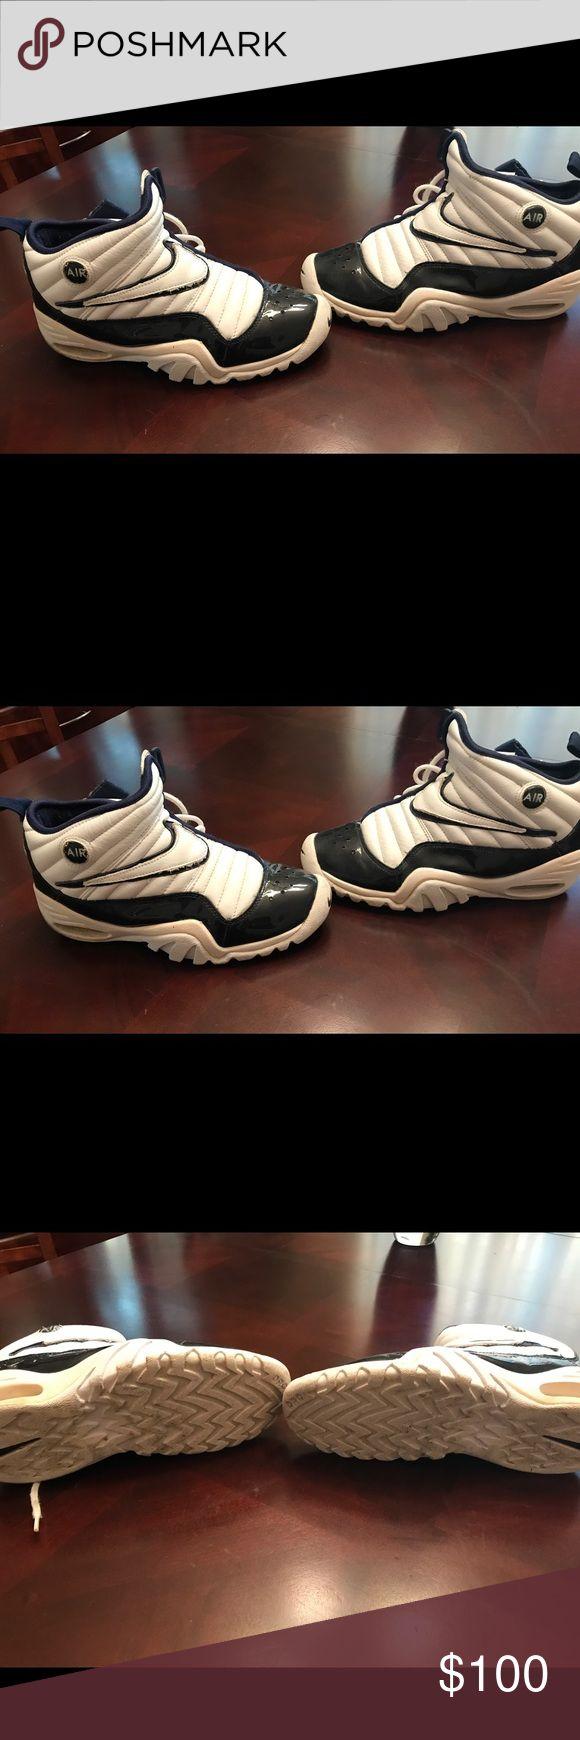 Nike Air Shake Ndestrukt Dennis Rodman Nike Air Shake Ndestrukt Dennis Rodman Original fair condition Nike Shoes Athletic Shoes